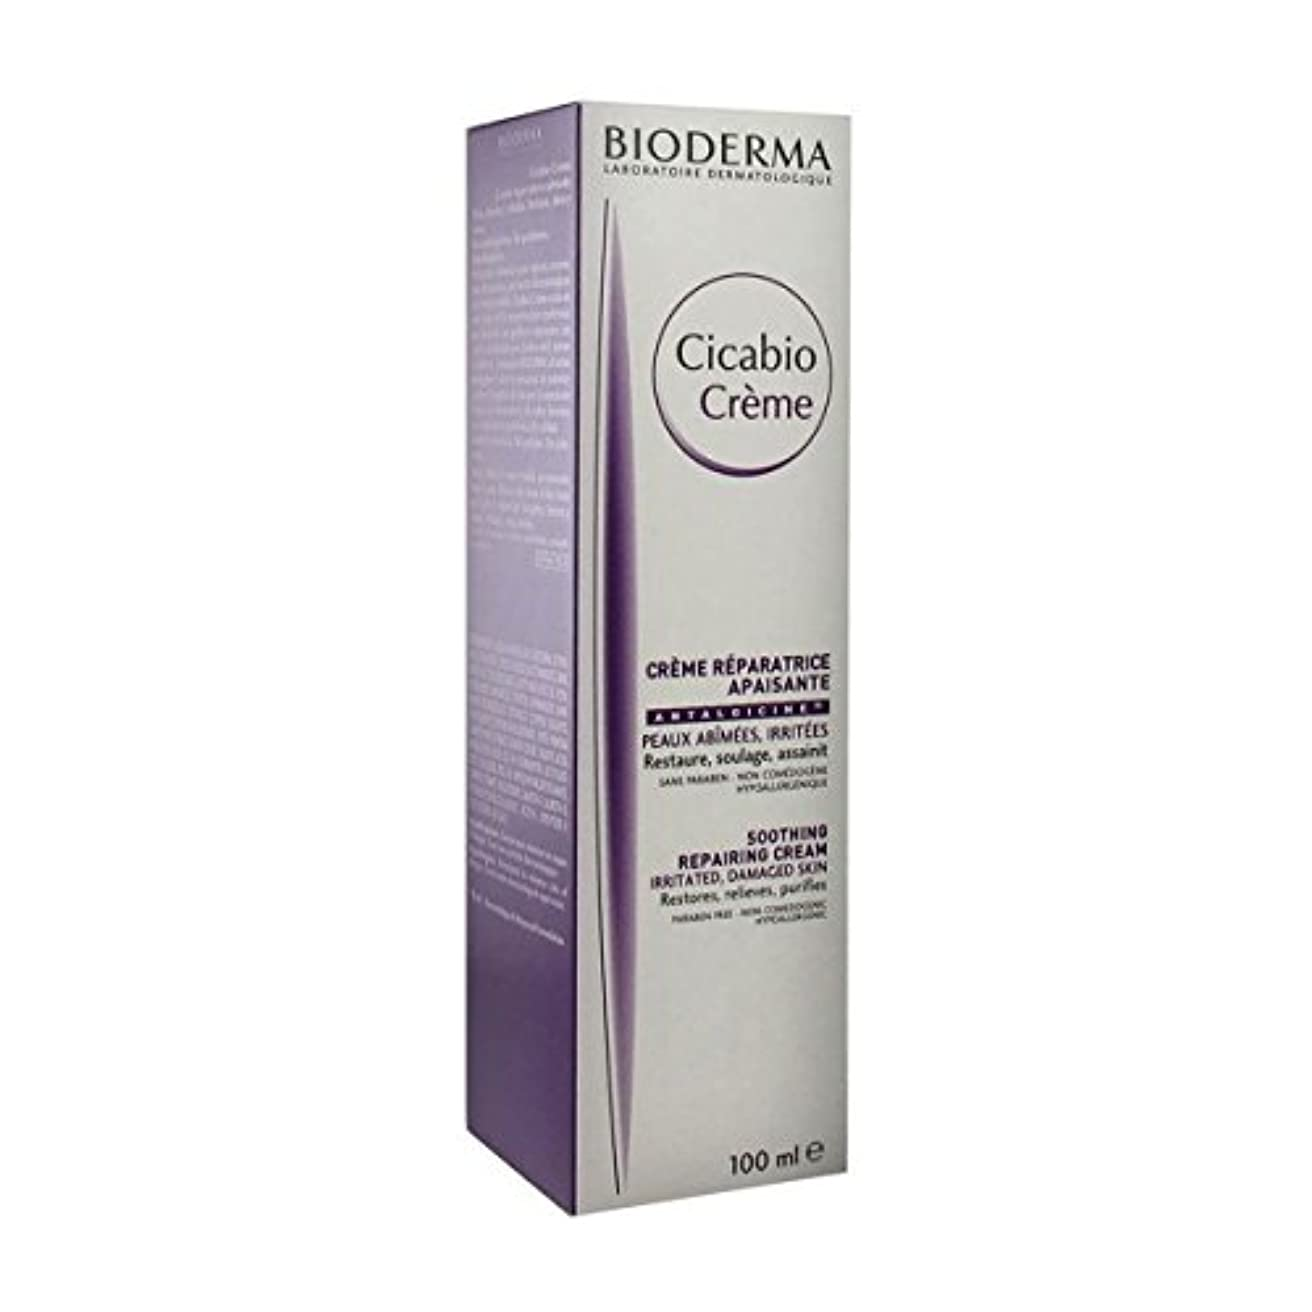 Bioderma Cicabio Cream 100ml [並行輸入品]